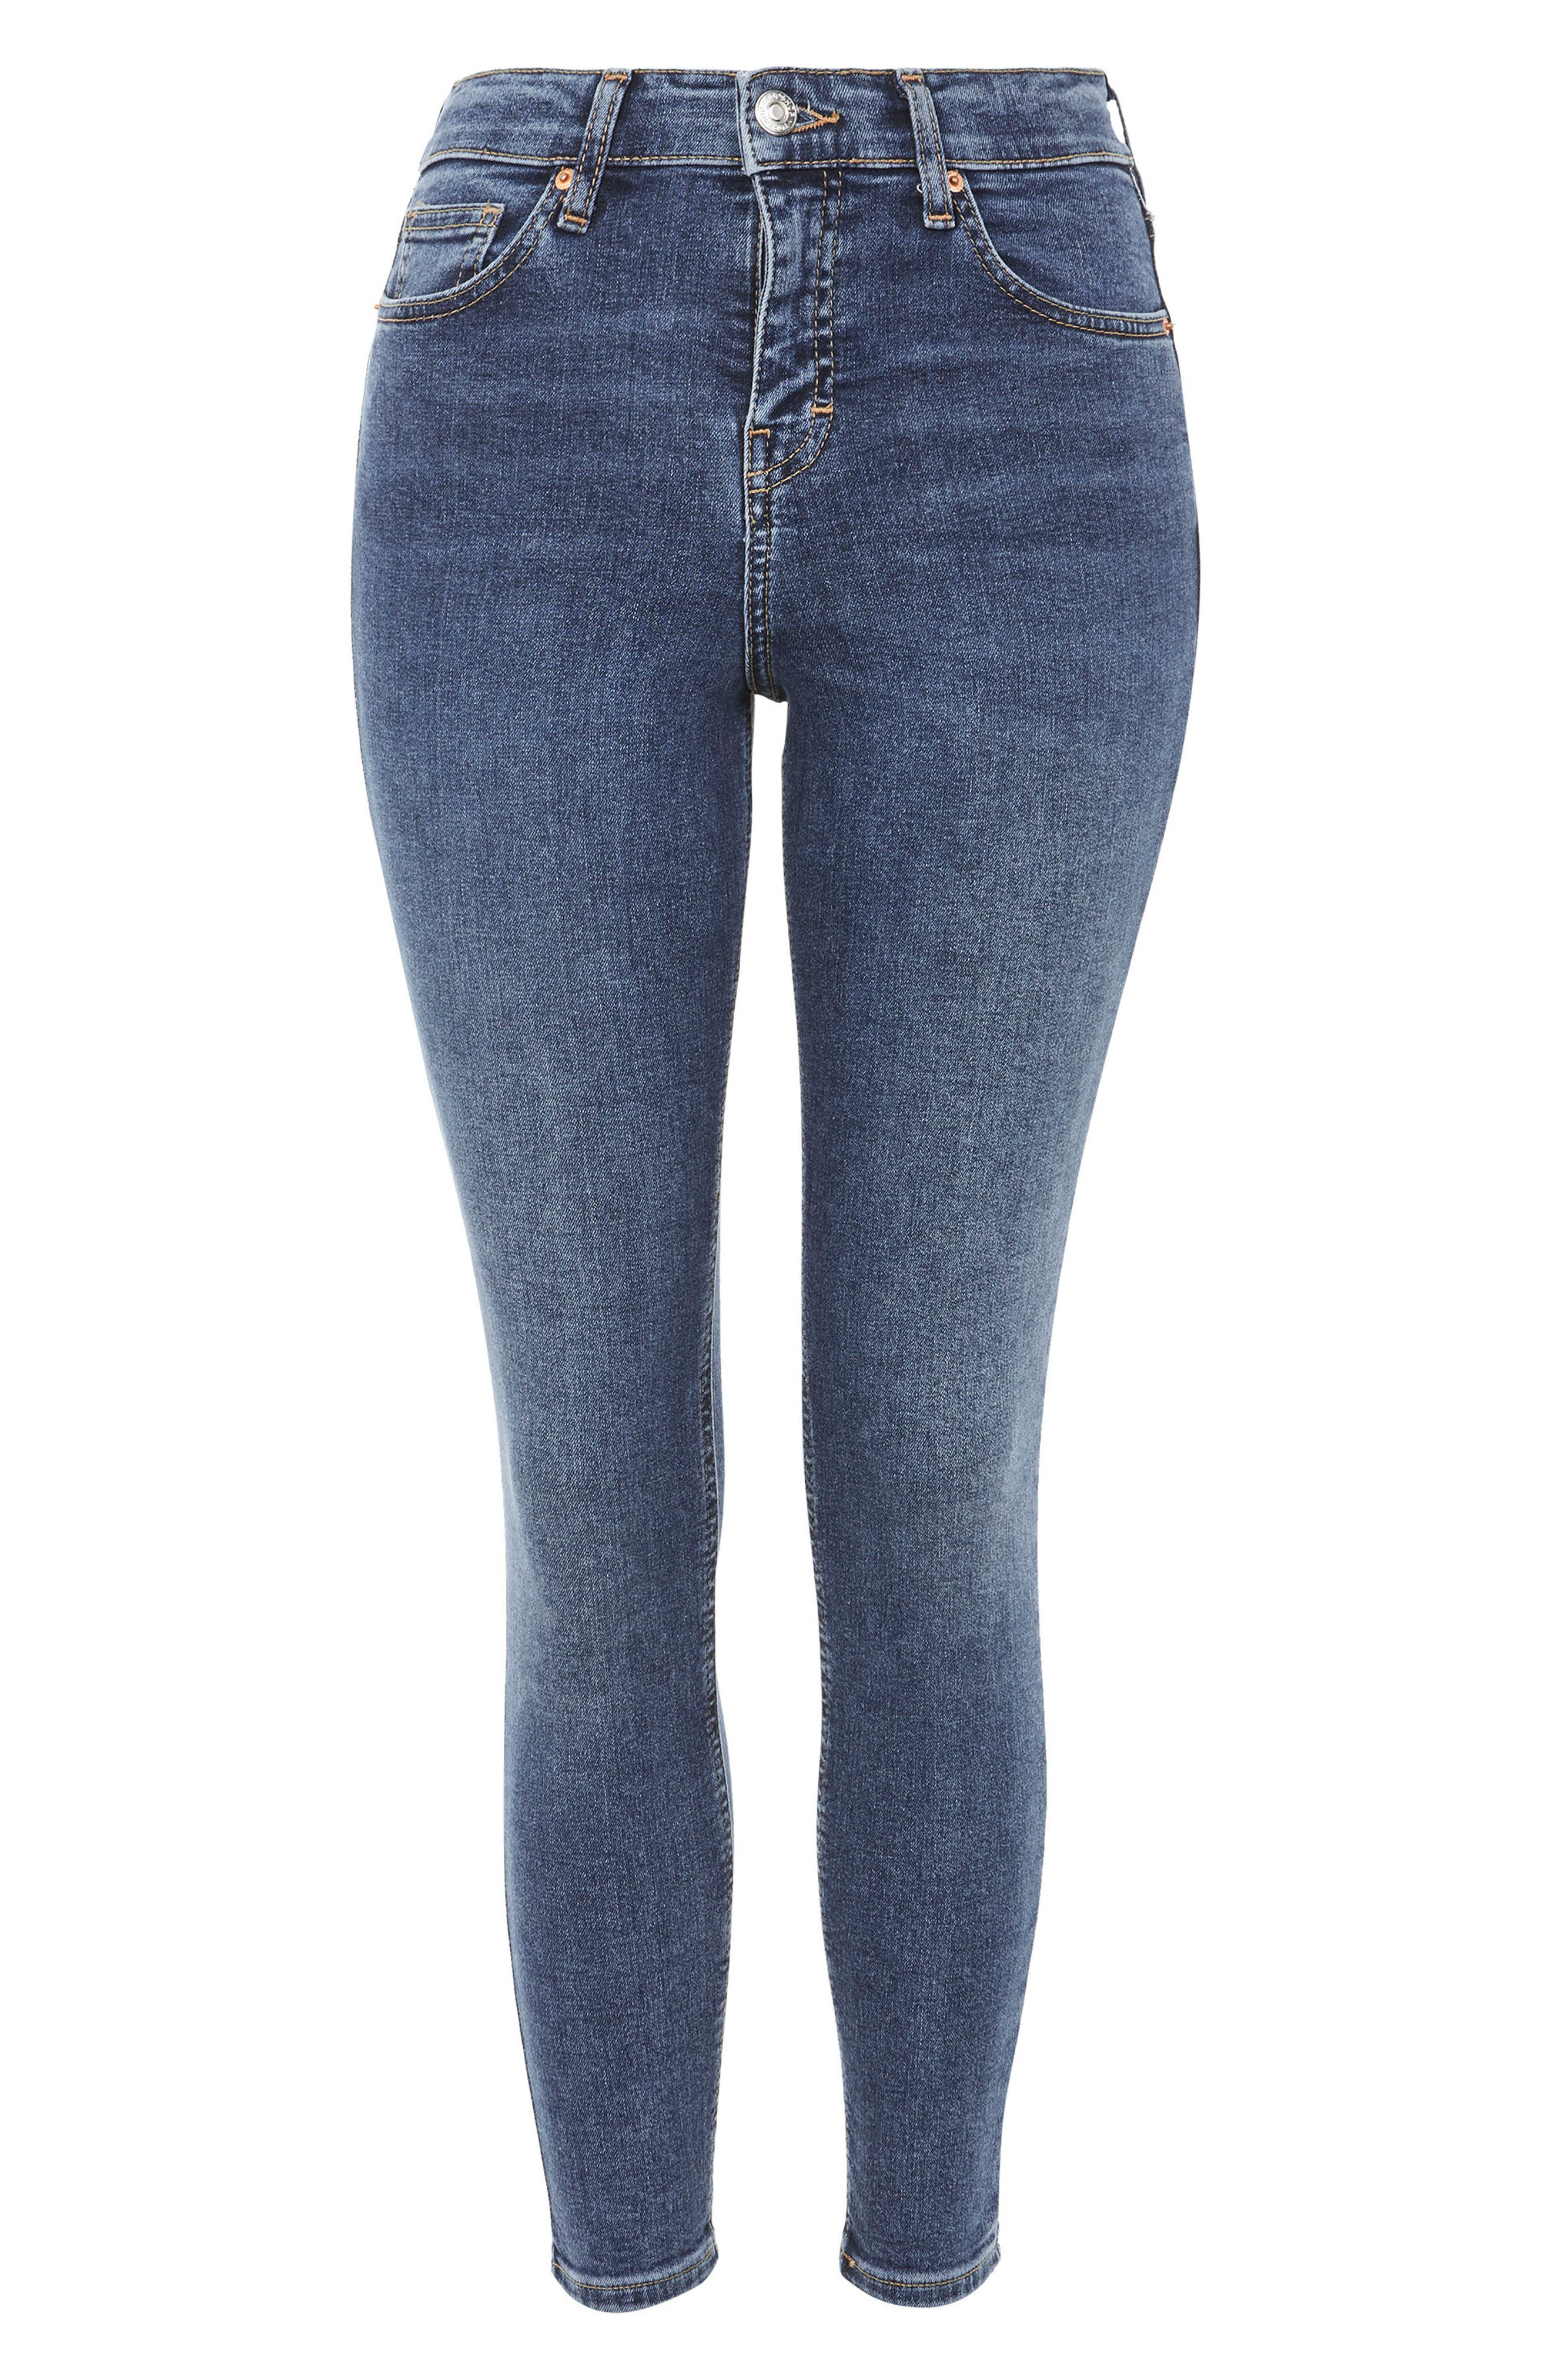 TOPSHOP,                             Jamie Petite Jeans,                             Alternate thumbnail 3, color,                             INDIGO